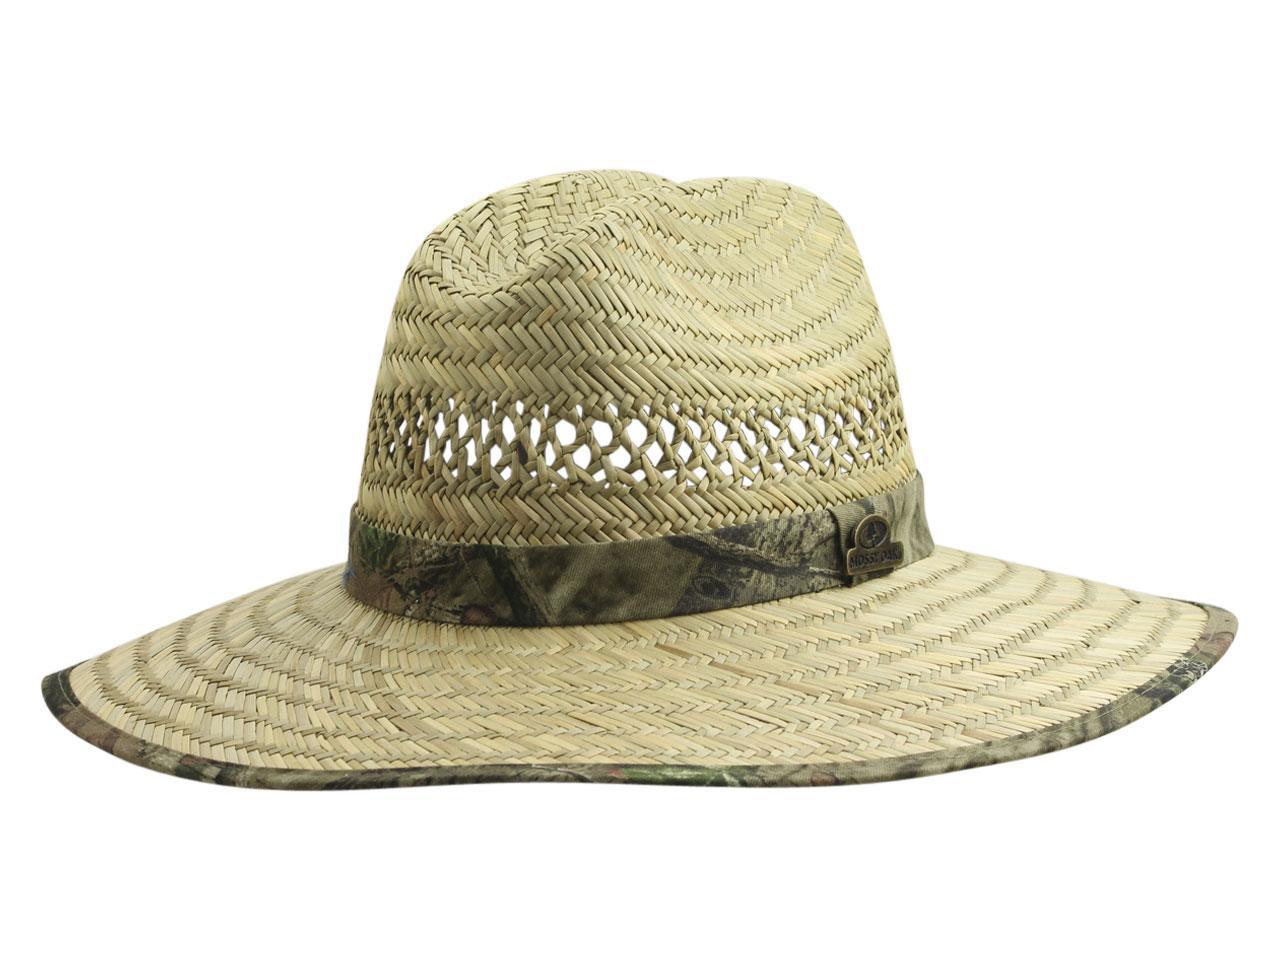 742de96c7 Mossy Oak Men's Big Brim Rush Straw Hat